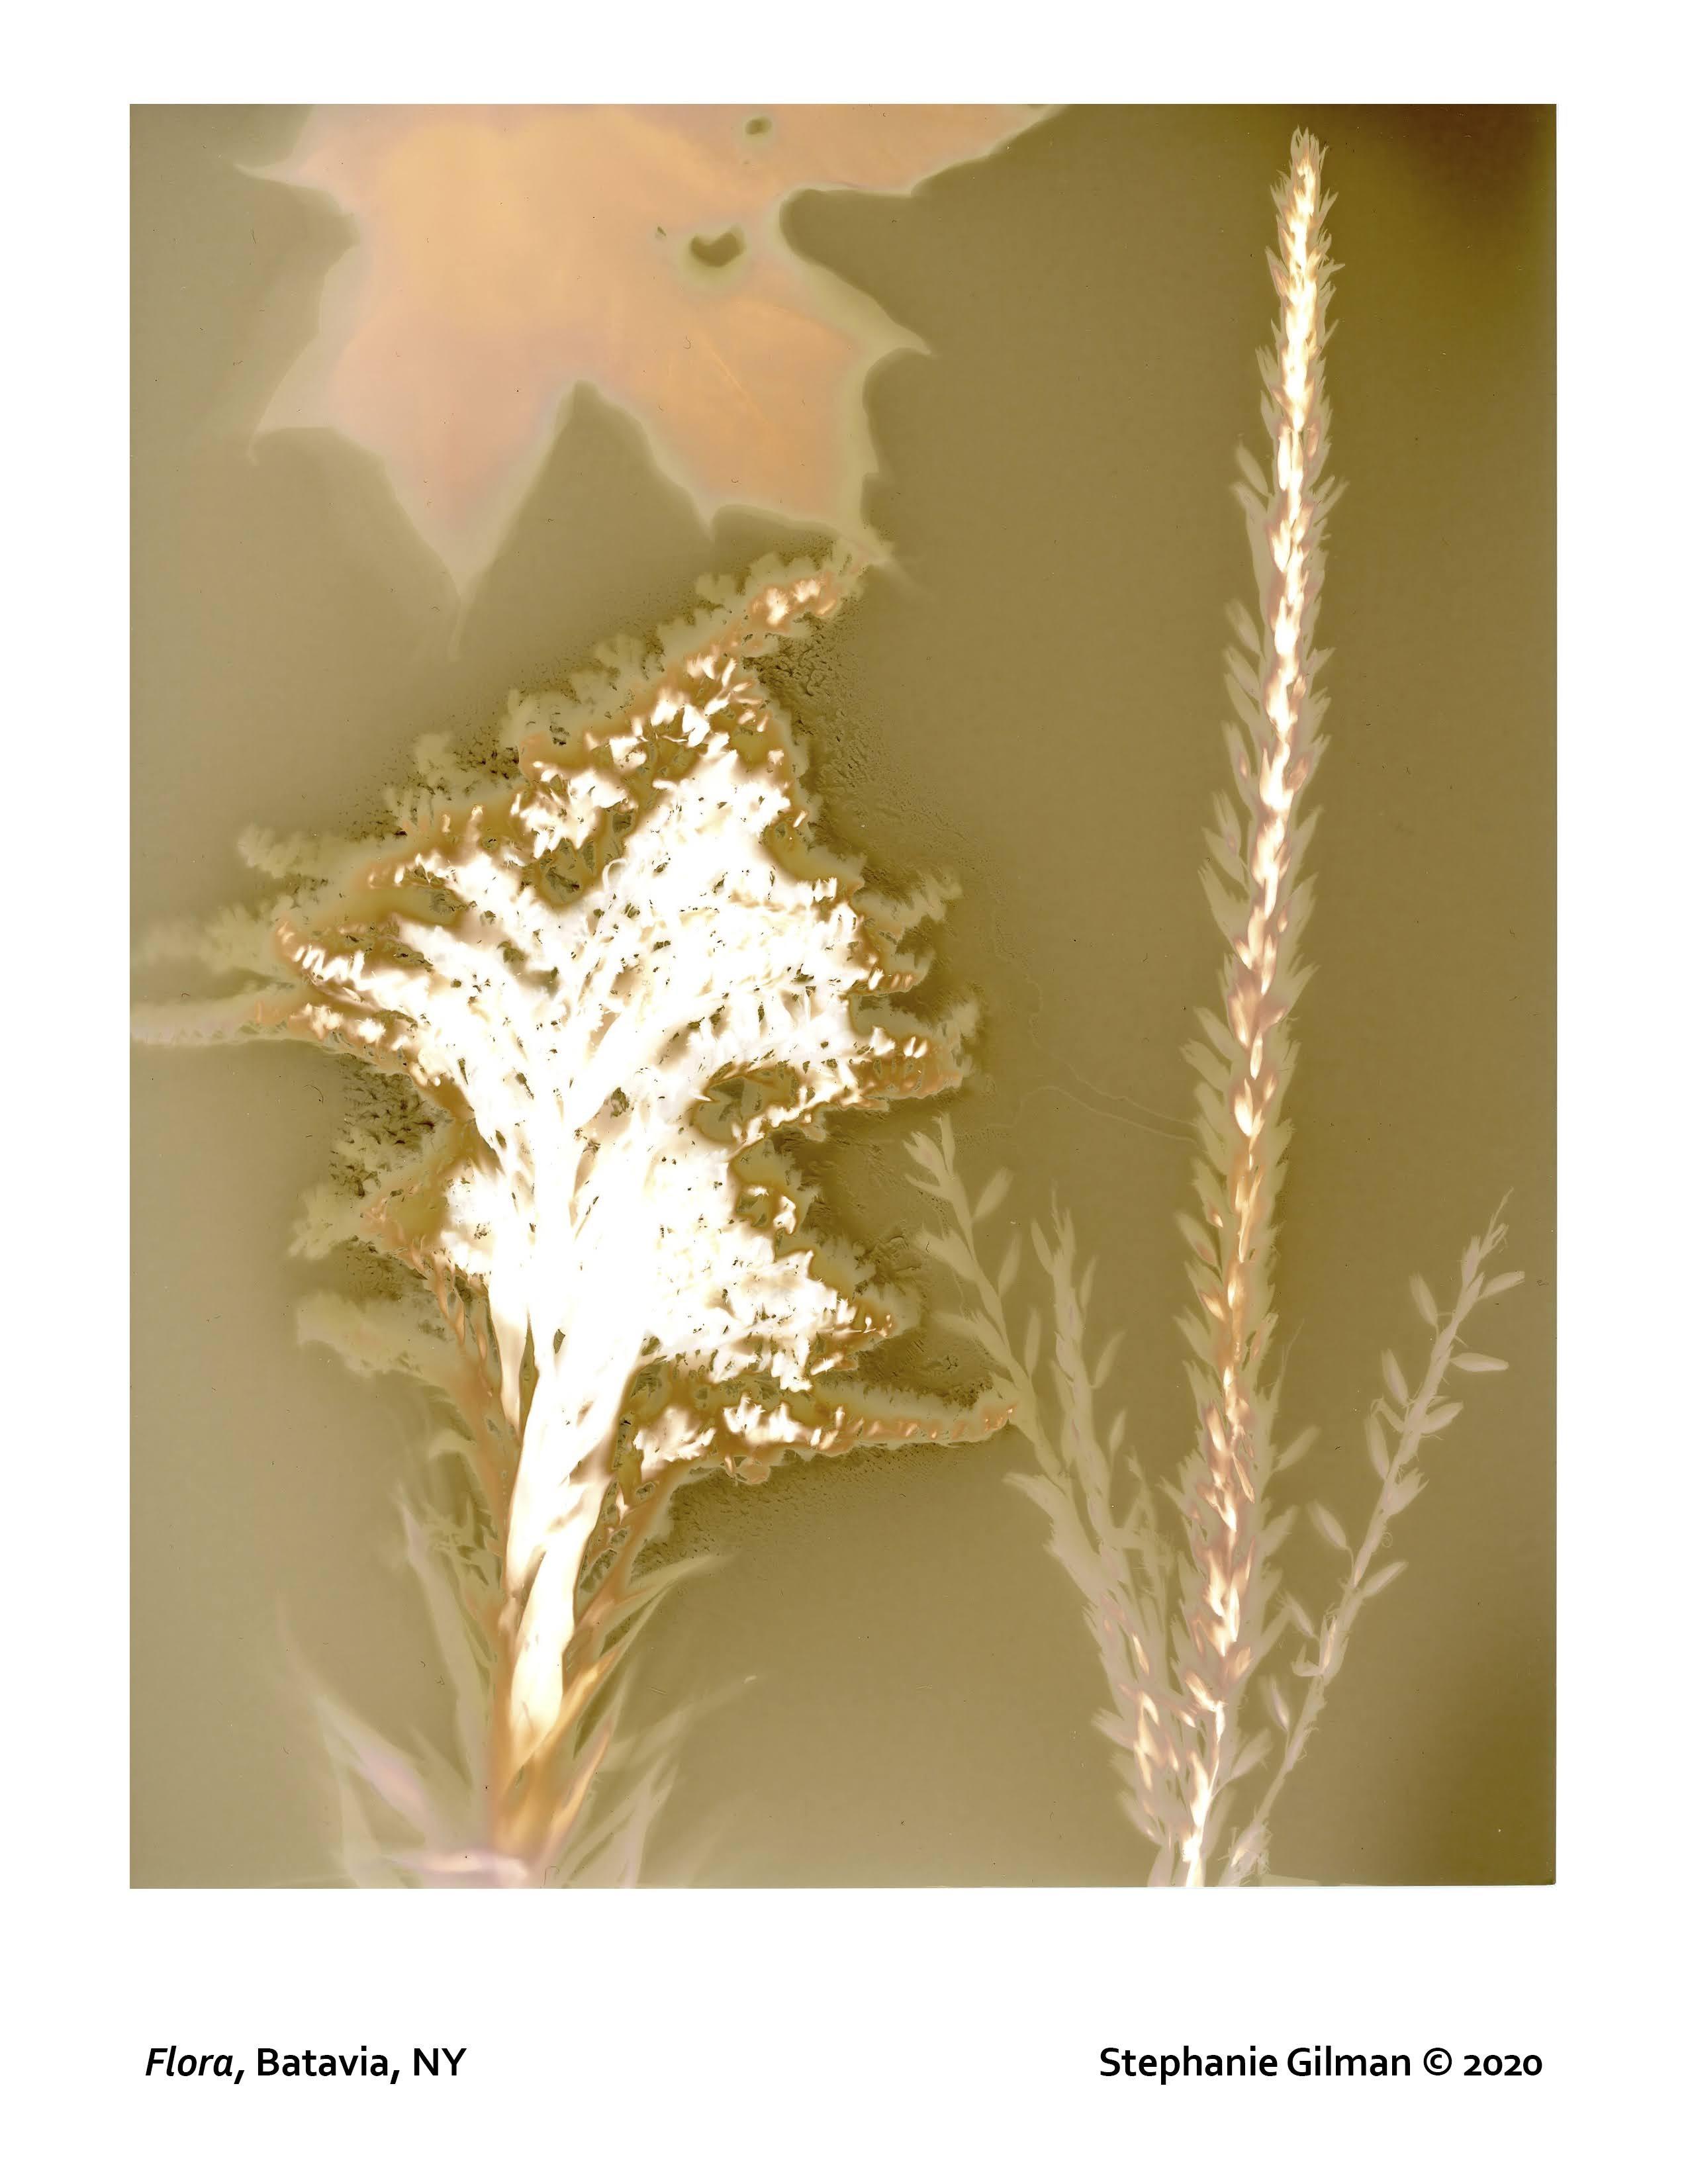 Stephanie Gilman lumen print